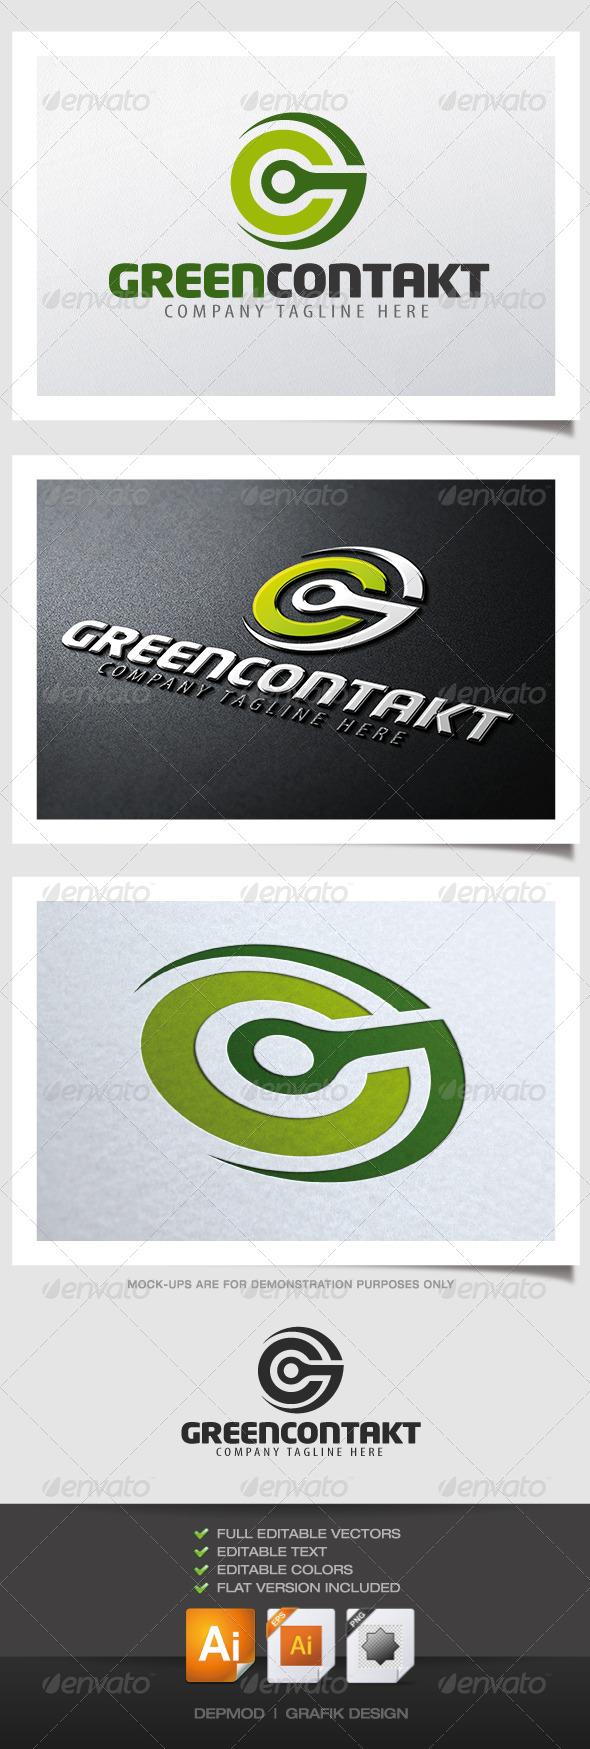 Green Contakt Logo